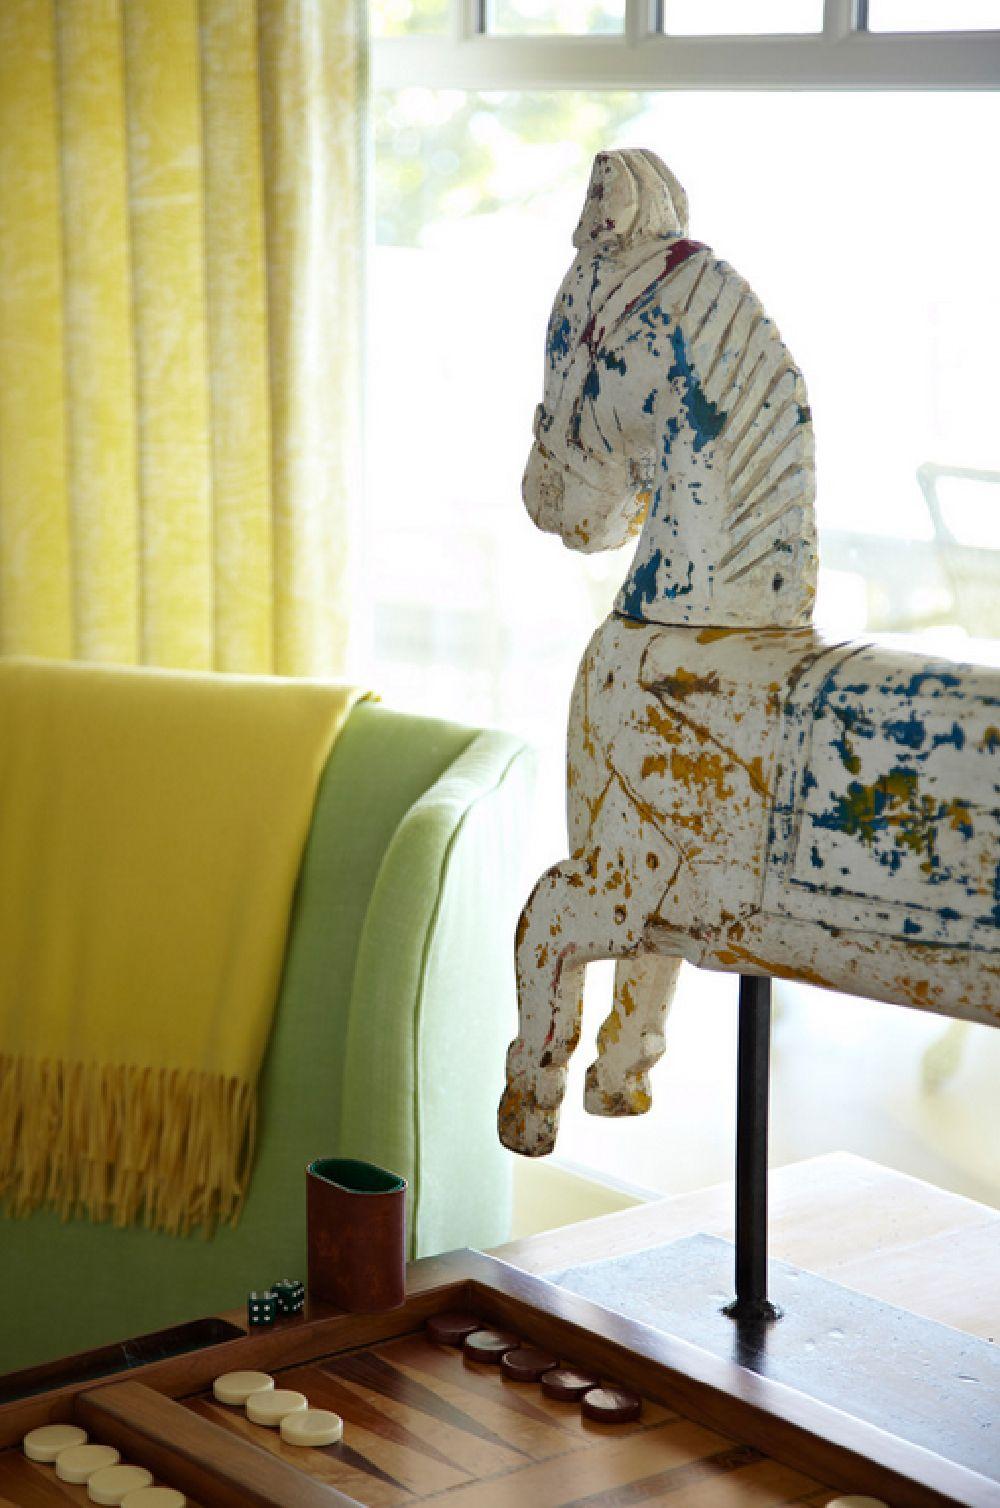 adelaparvu.com casa din lemn cu interior in nuante pastelate, casa SUA Michigan, design interior Tom Stringer, Foto Werner Straube (5)